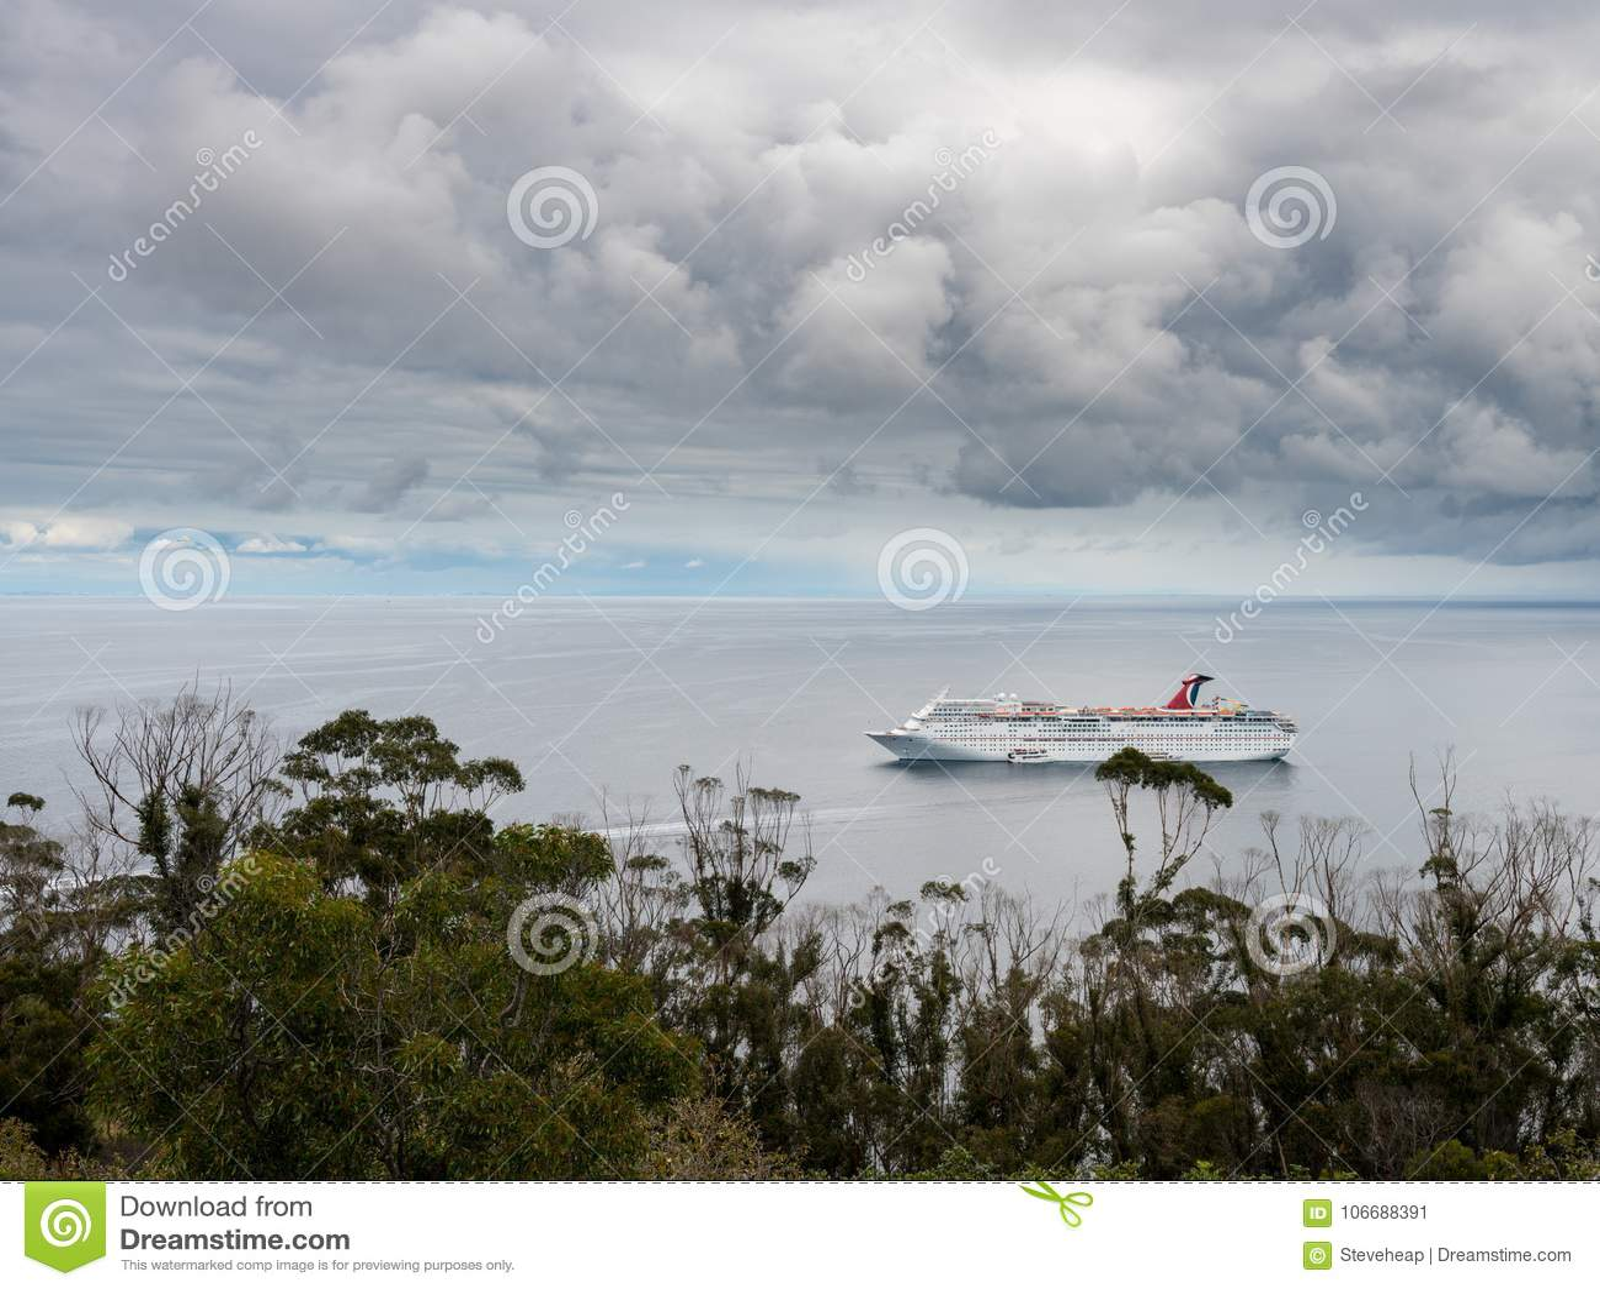 carnival cruise ship visits avalon on catalina island editorial